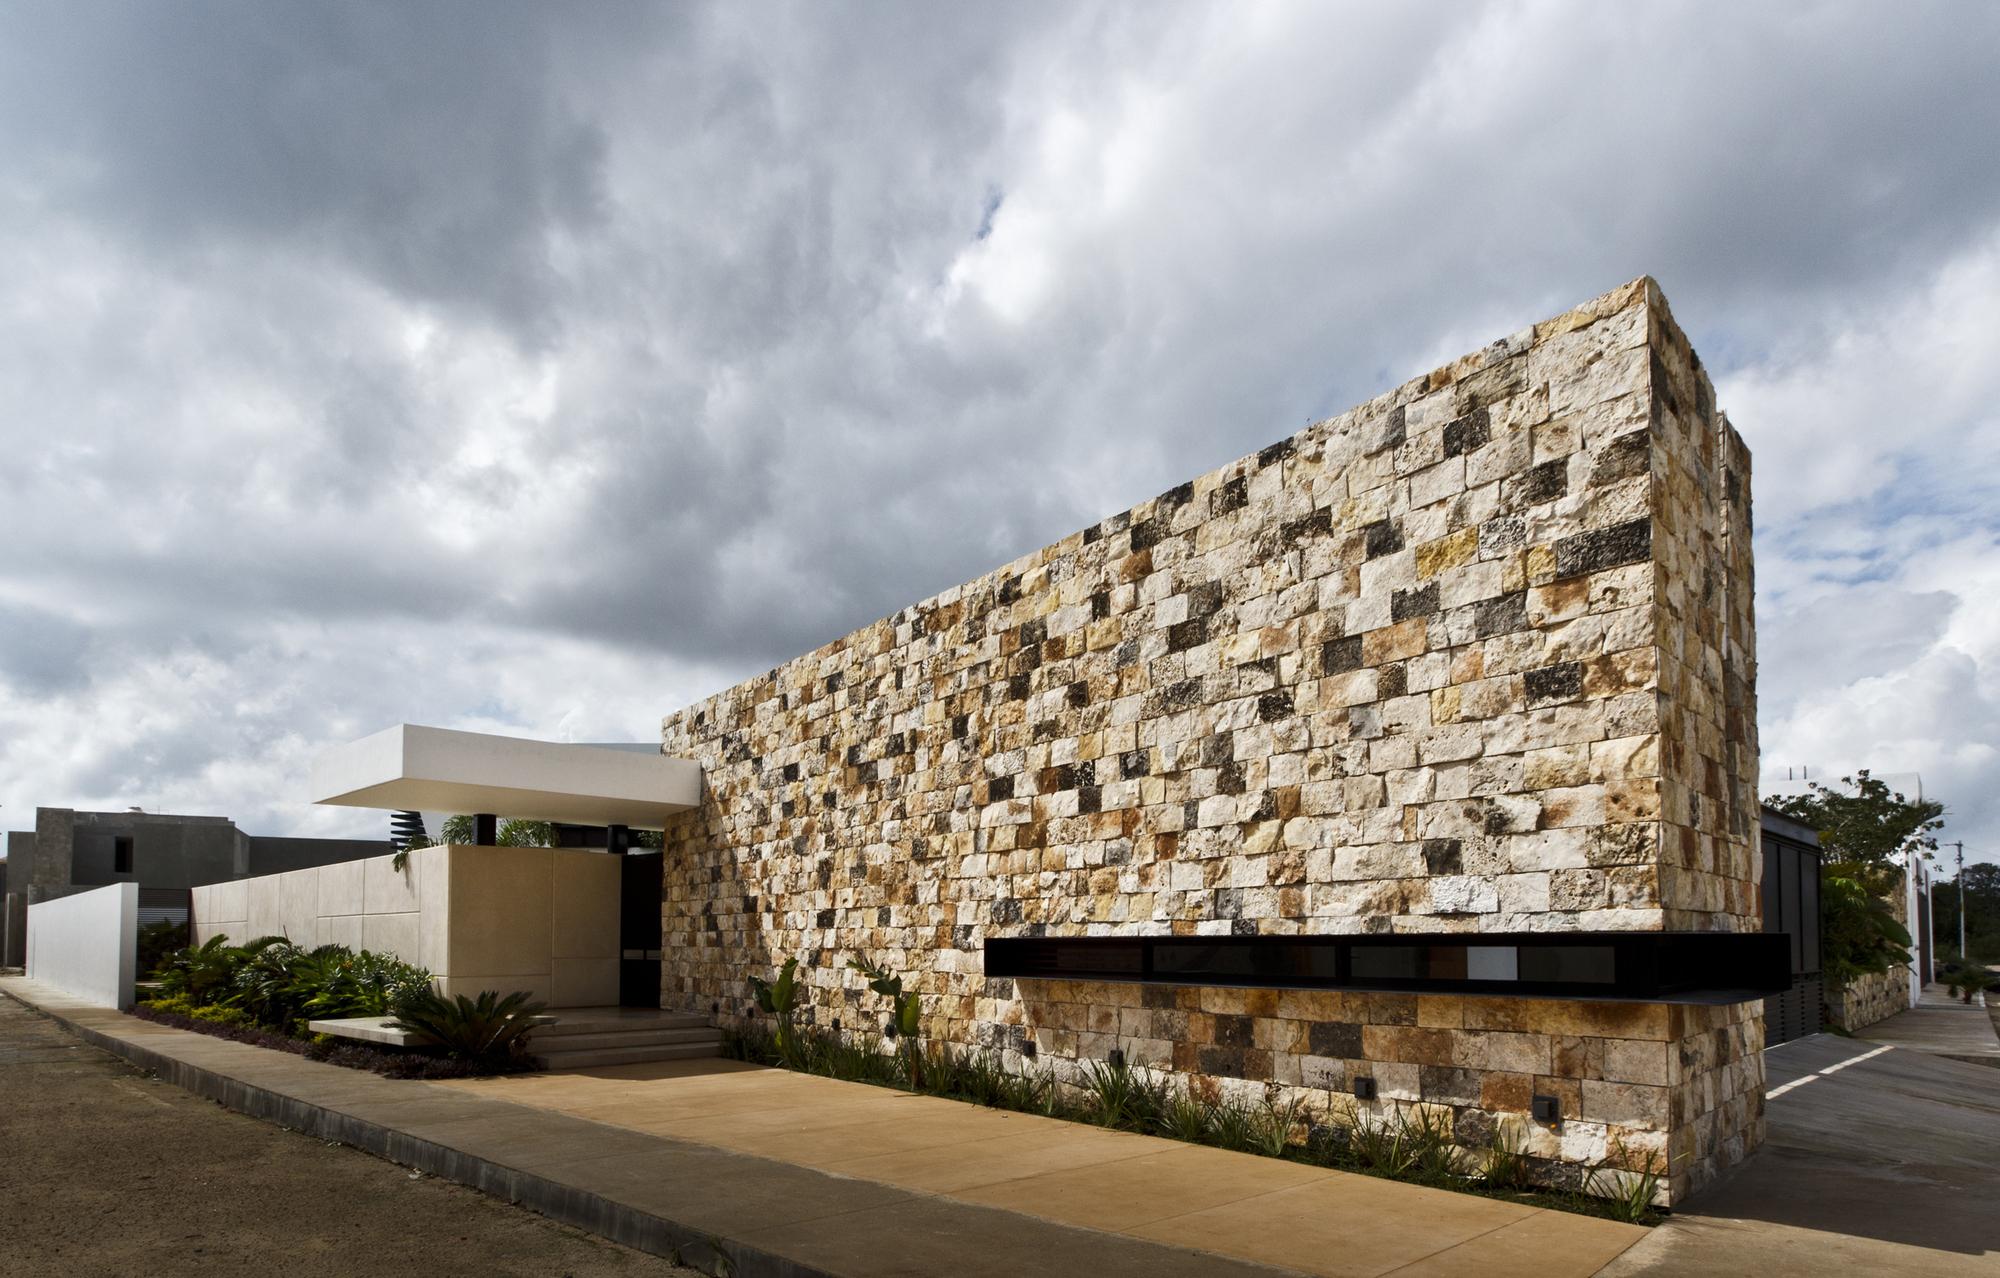 5305f3abe8e44e2ac3000005_temozon-house-carrillo-arquitectos-y-asociados_temozon_foto_01